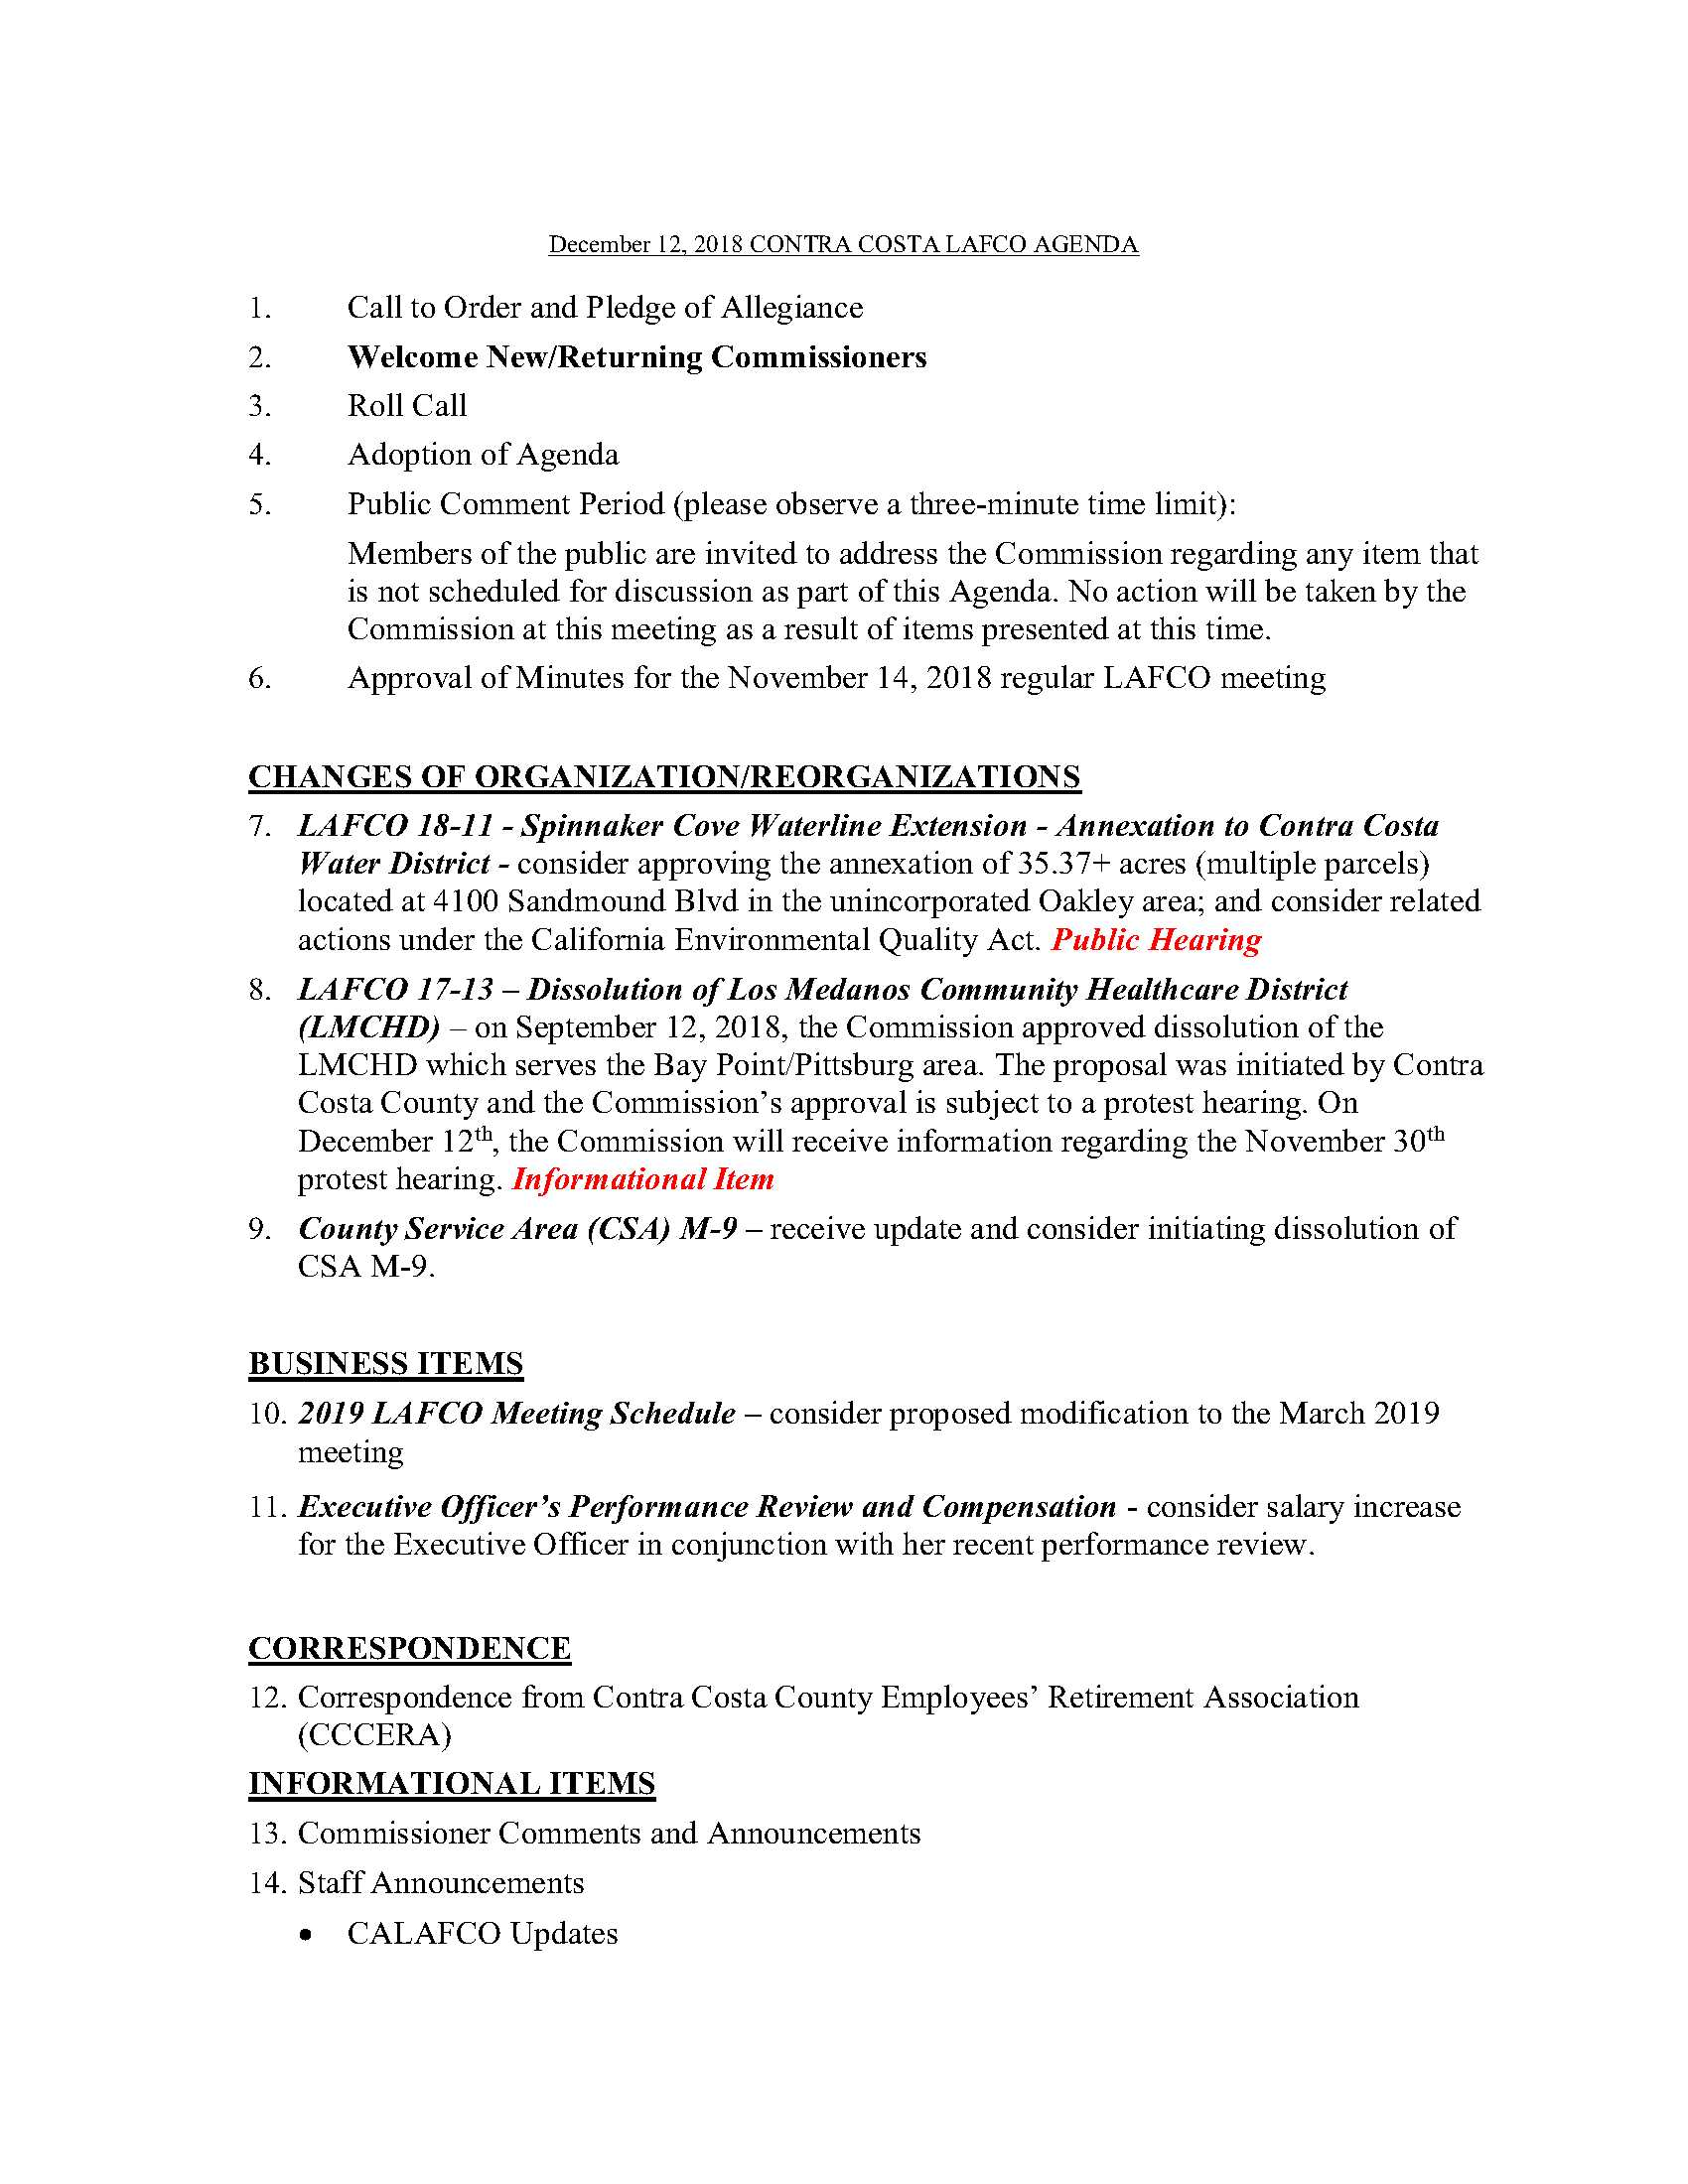 ESMAC Agenda 12.13.2018 (51 Pages)_27.jpg